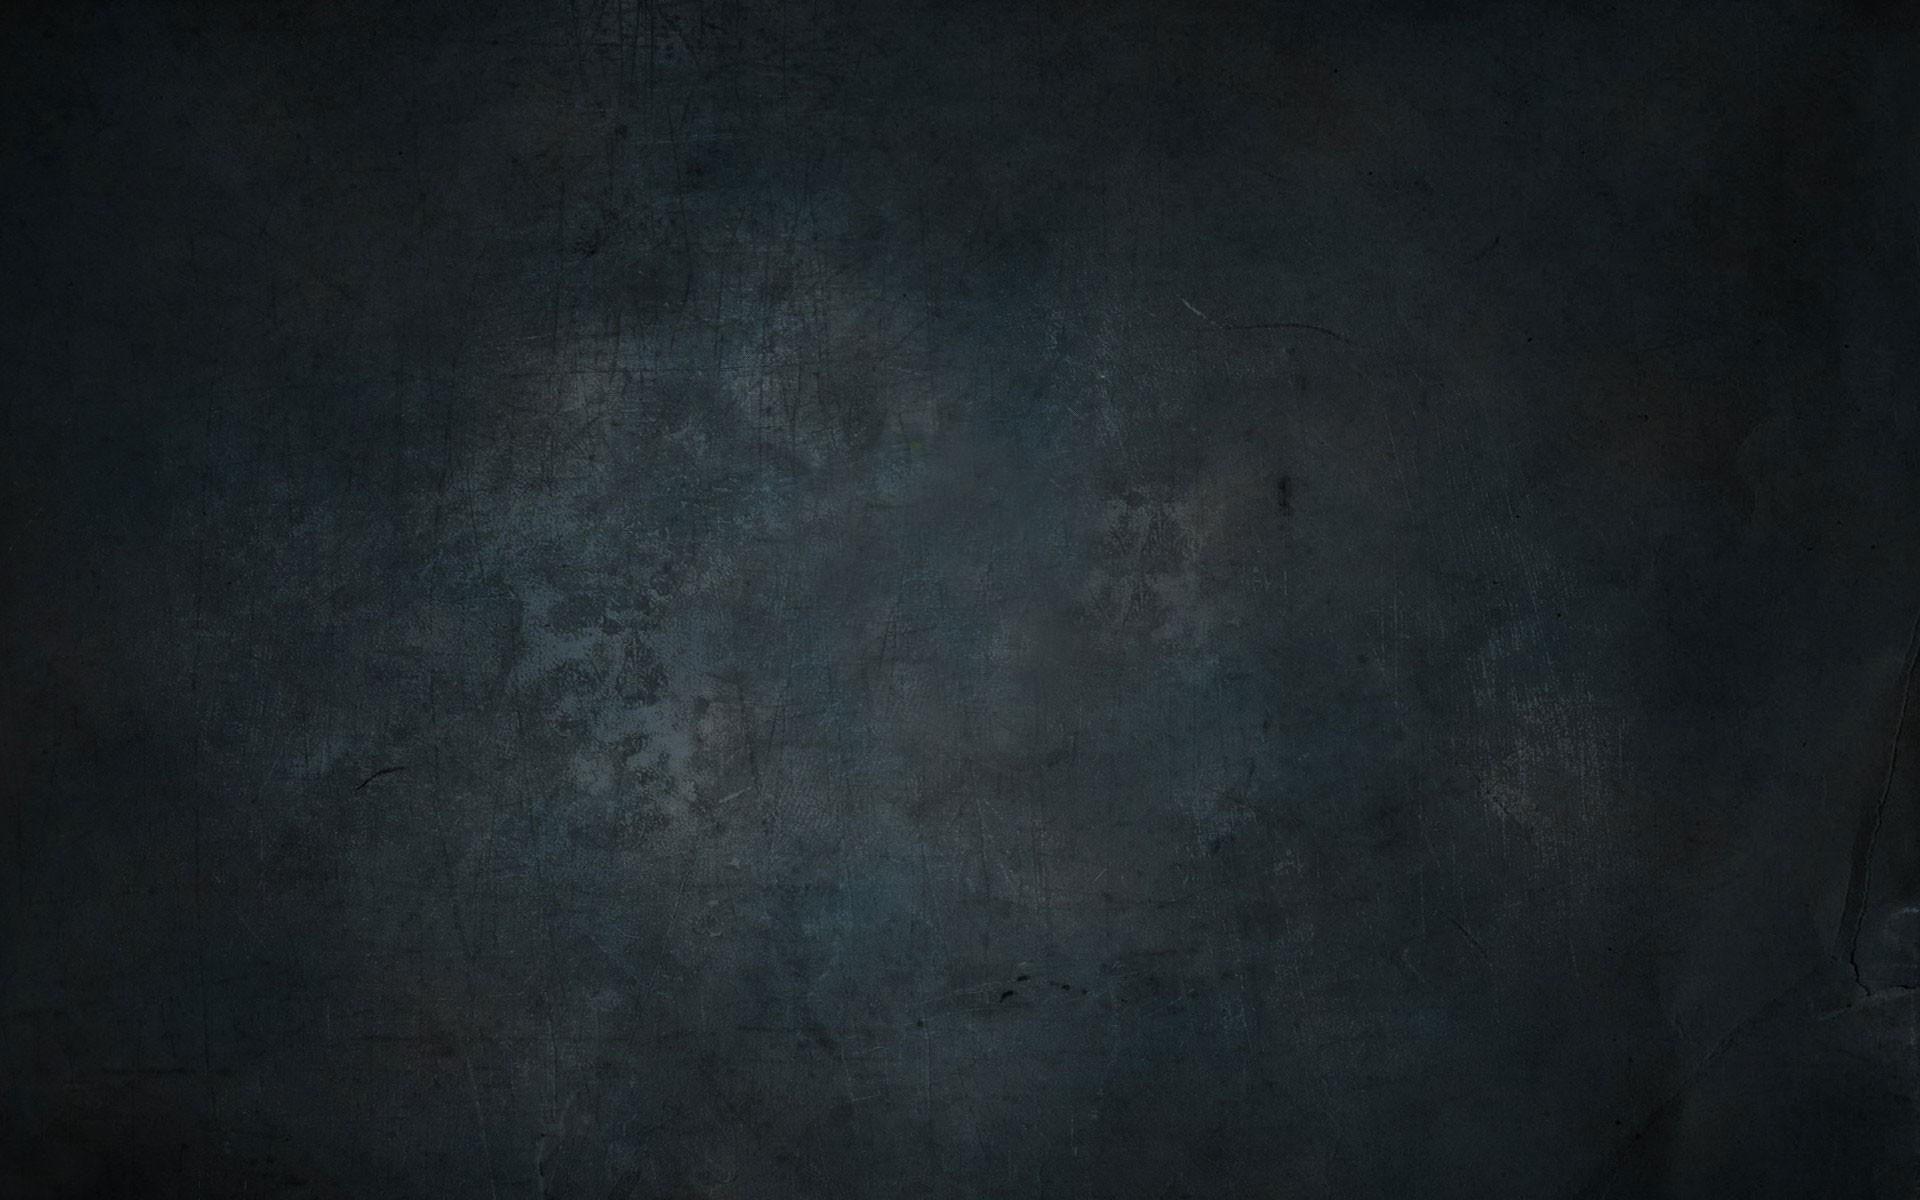 Simple Gray Background HD desktop wallpaper : High Definition 1024×768 Grey  Wallpaper Backgrounds (34 Wallpapers) | Adorable Wallpapers | Desktop …